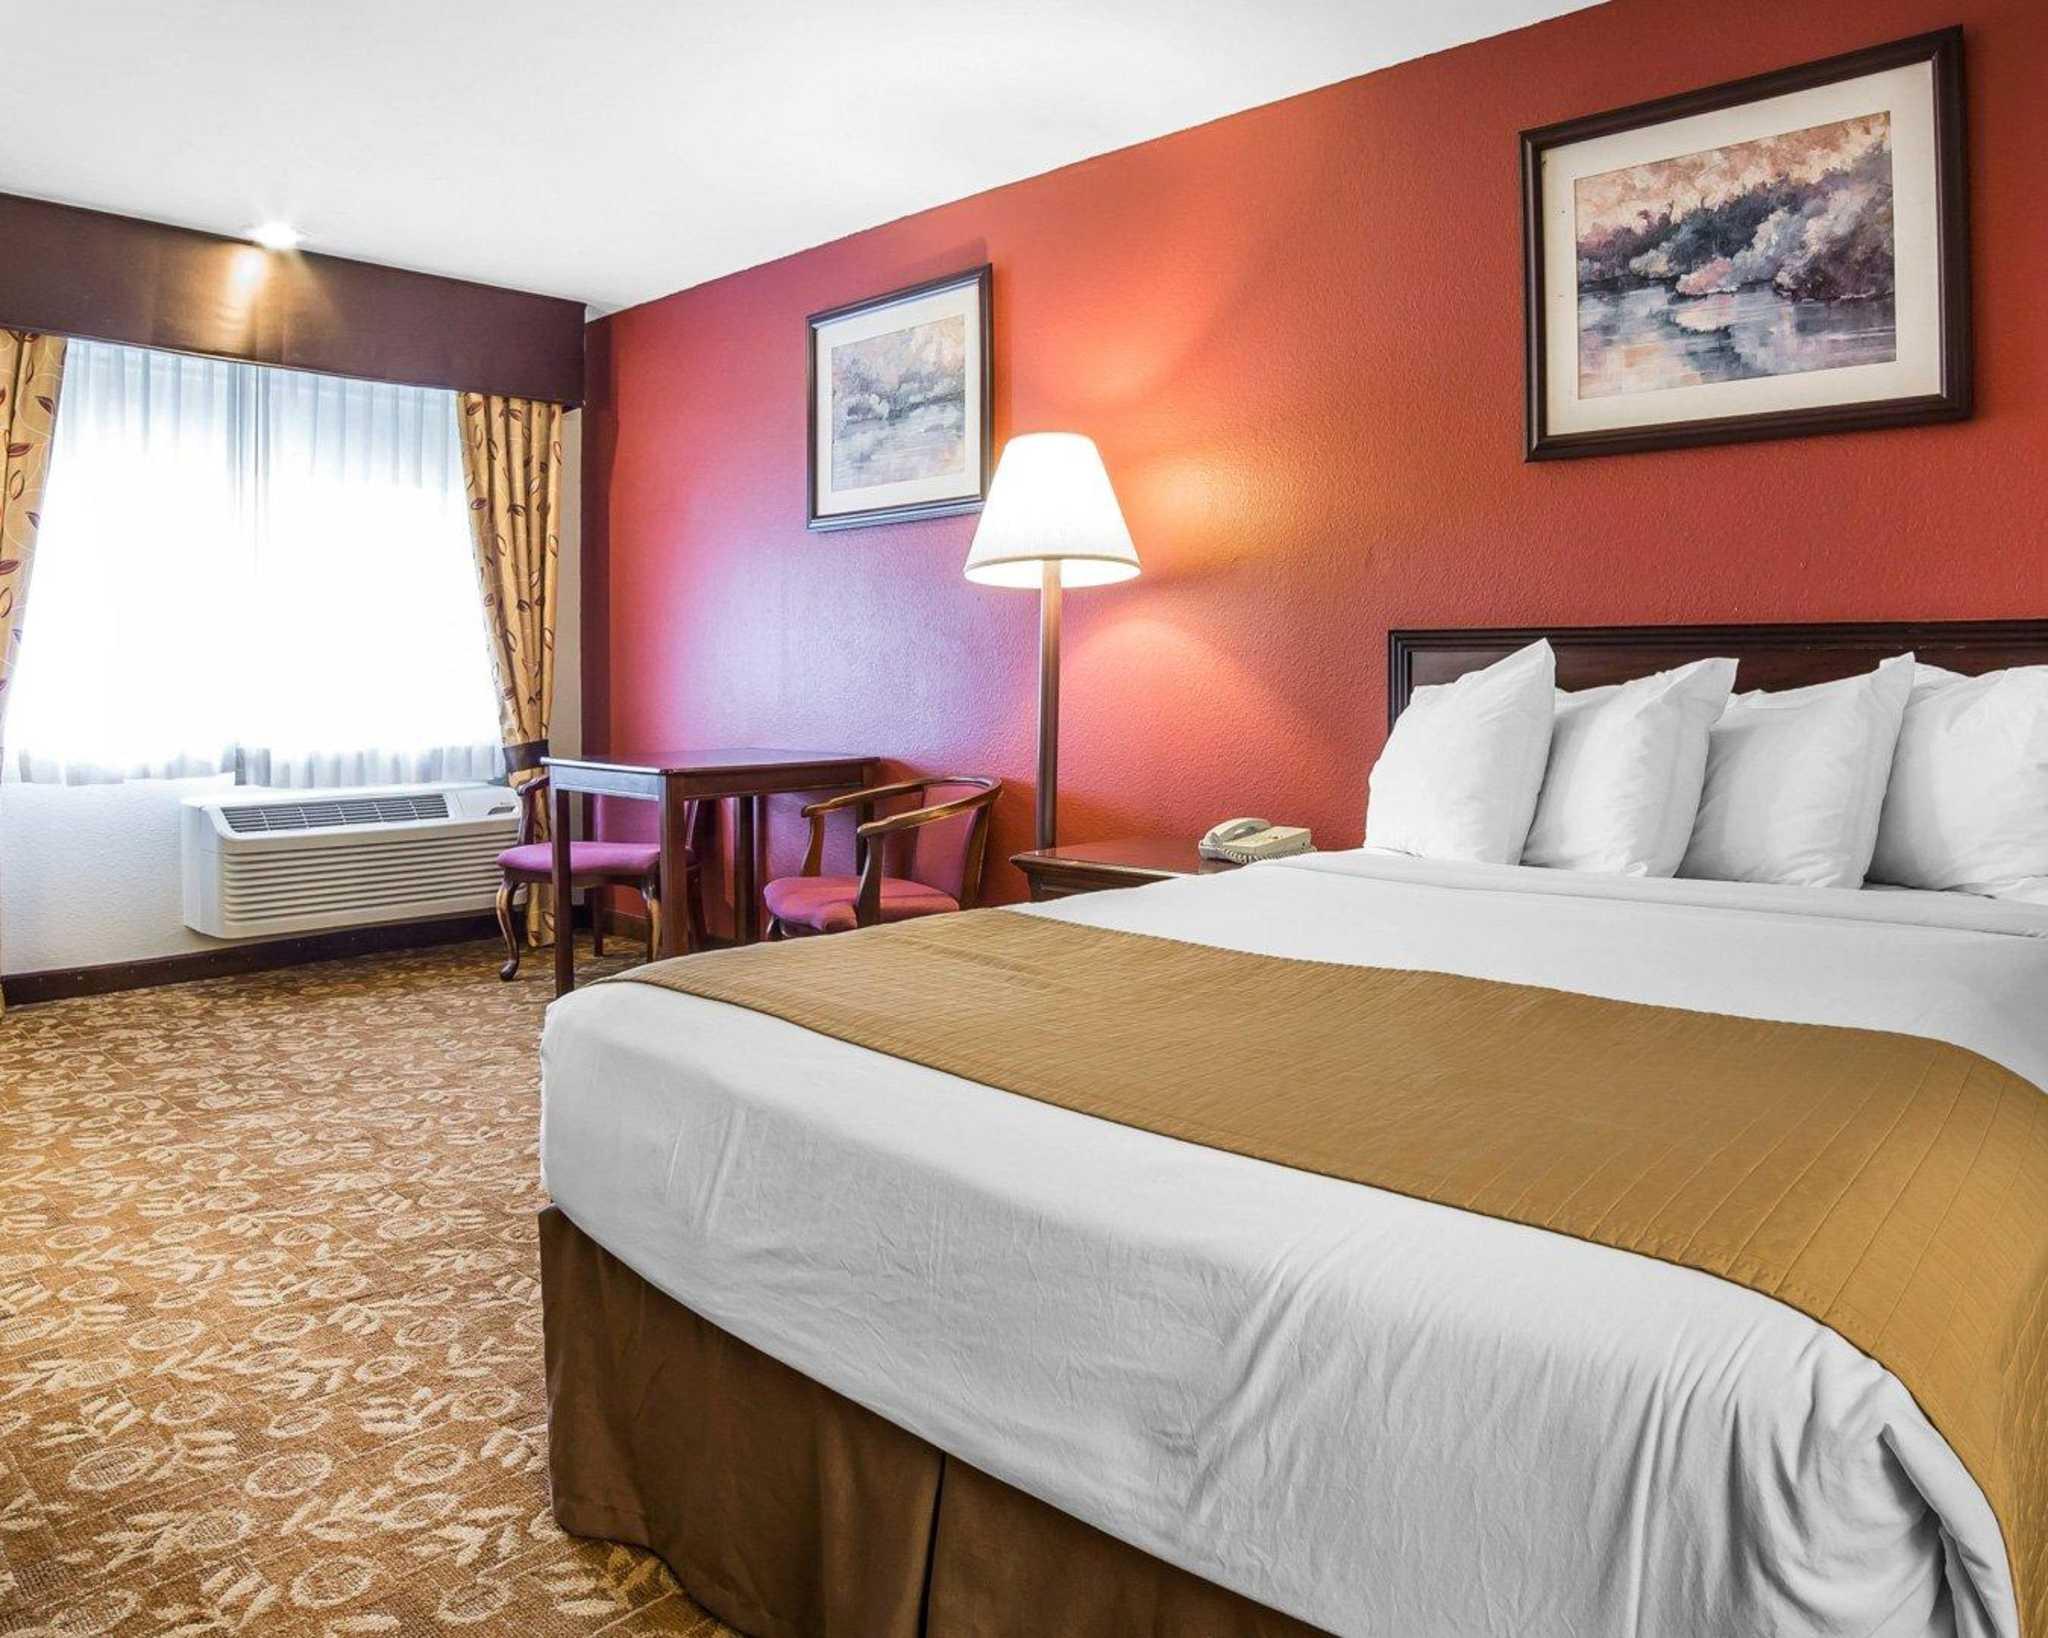 Quality Inn & Suites Minden US-395 image 19